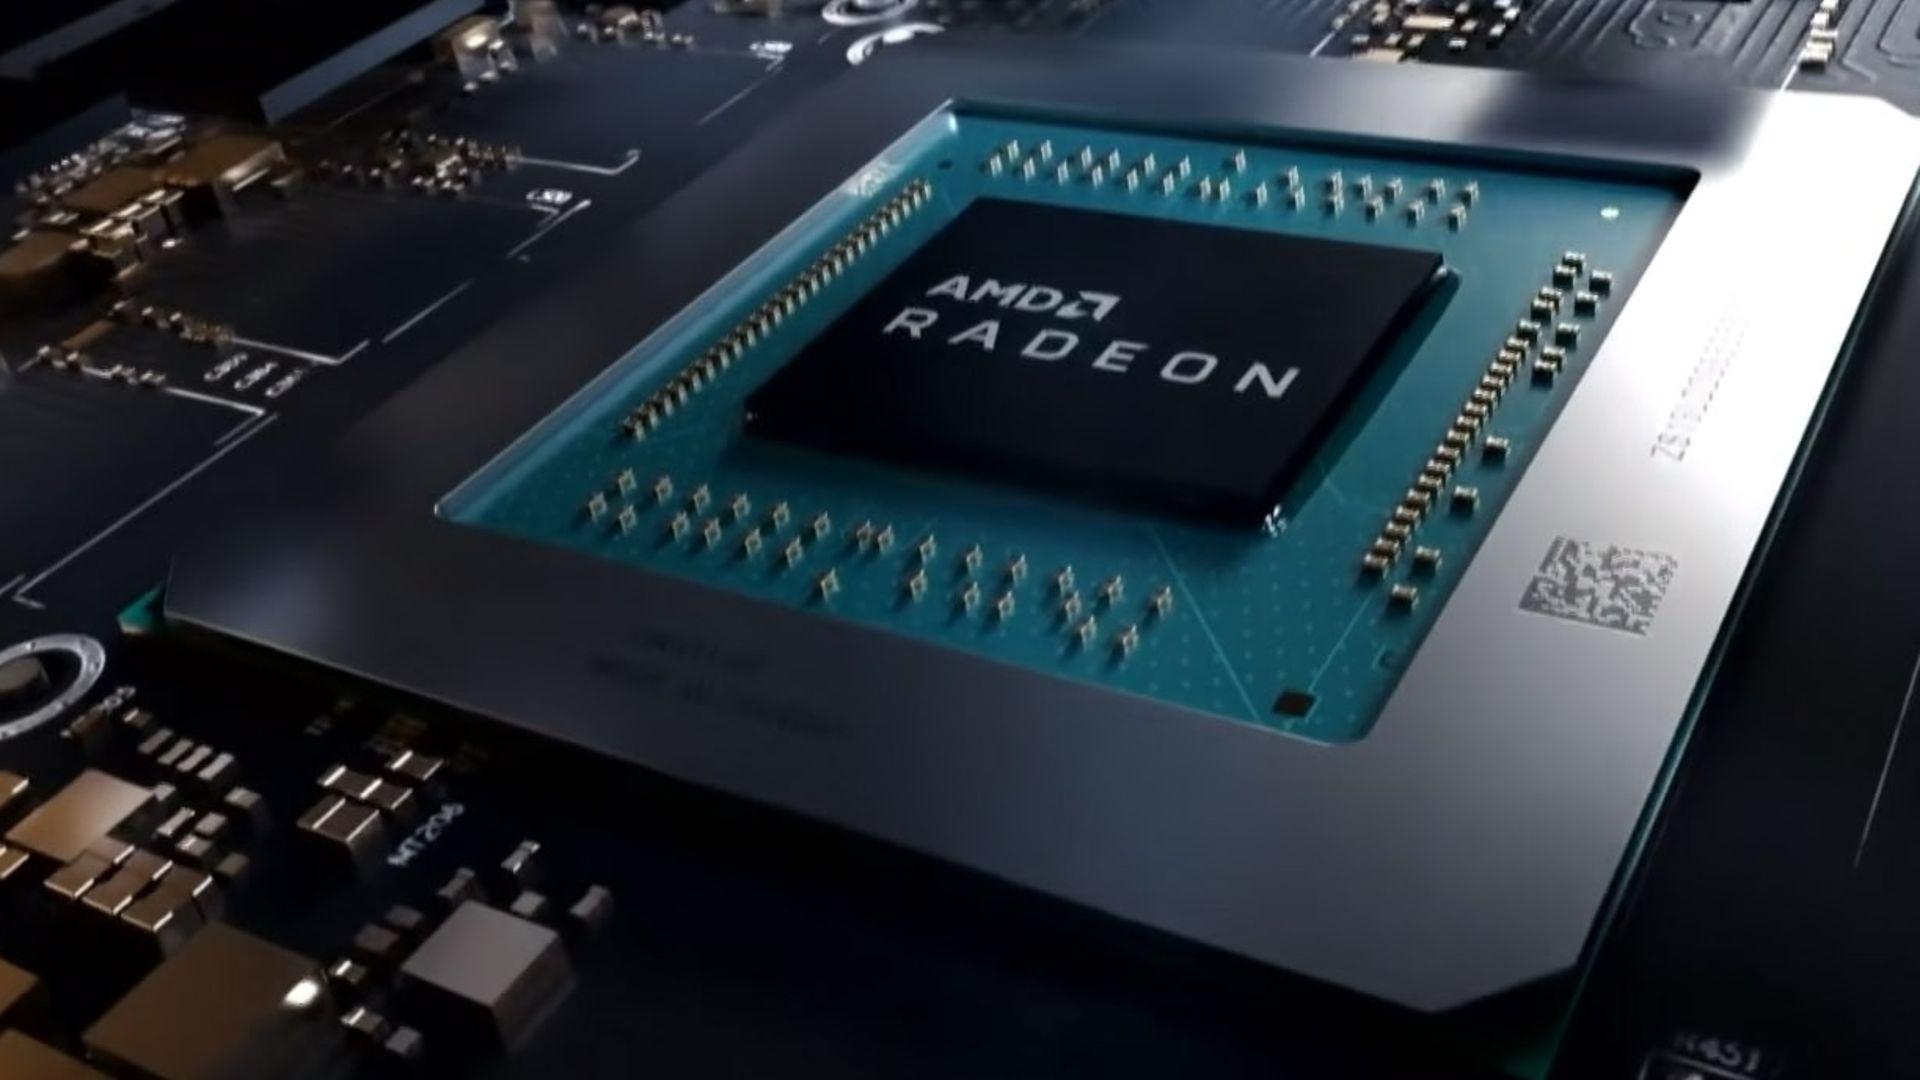 AMD Radeon 5300M